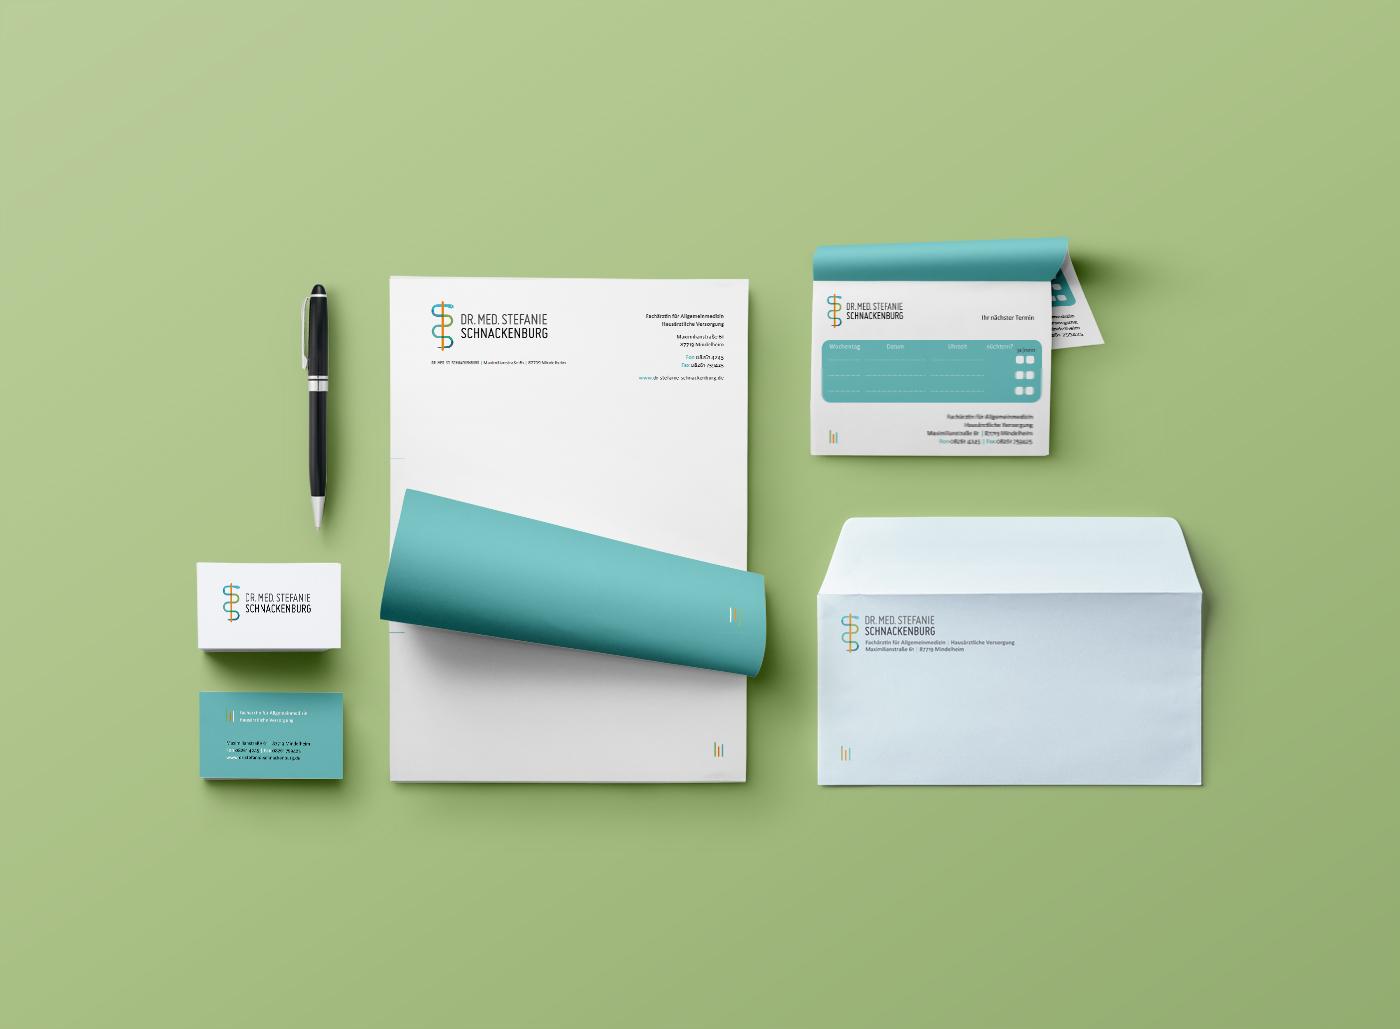 schnackenburg_geschaeftsausstattung_grafik_design_marina_grimme_augsburg